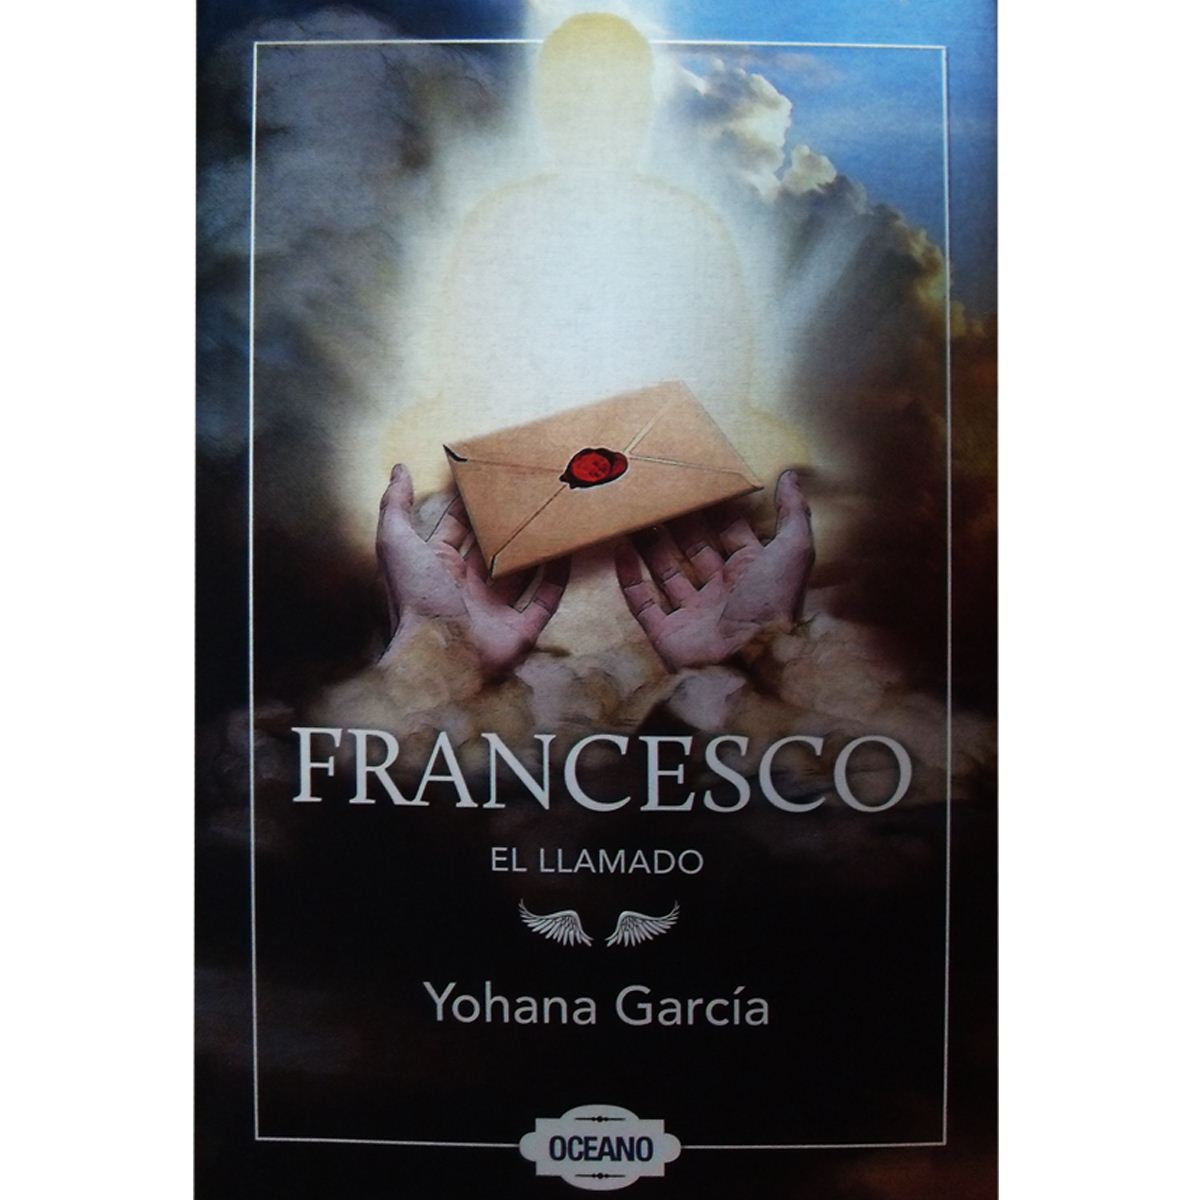 Francesco el llamado Libro - Sanborns